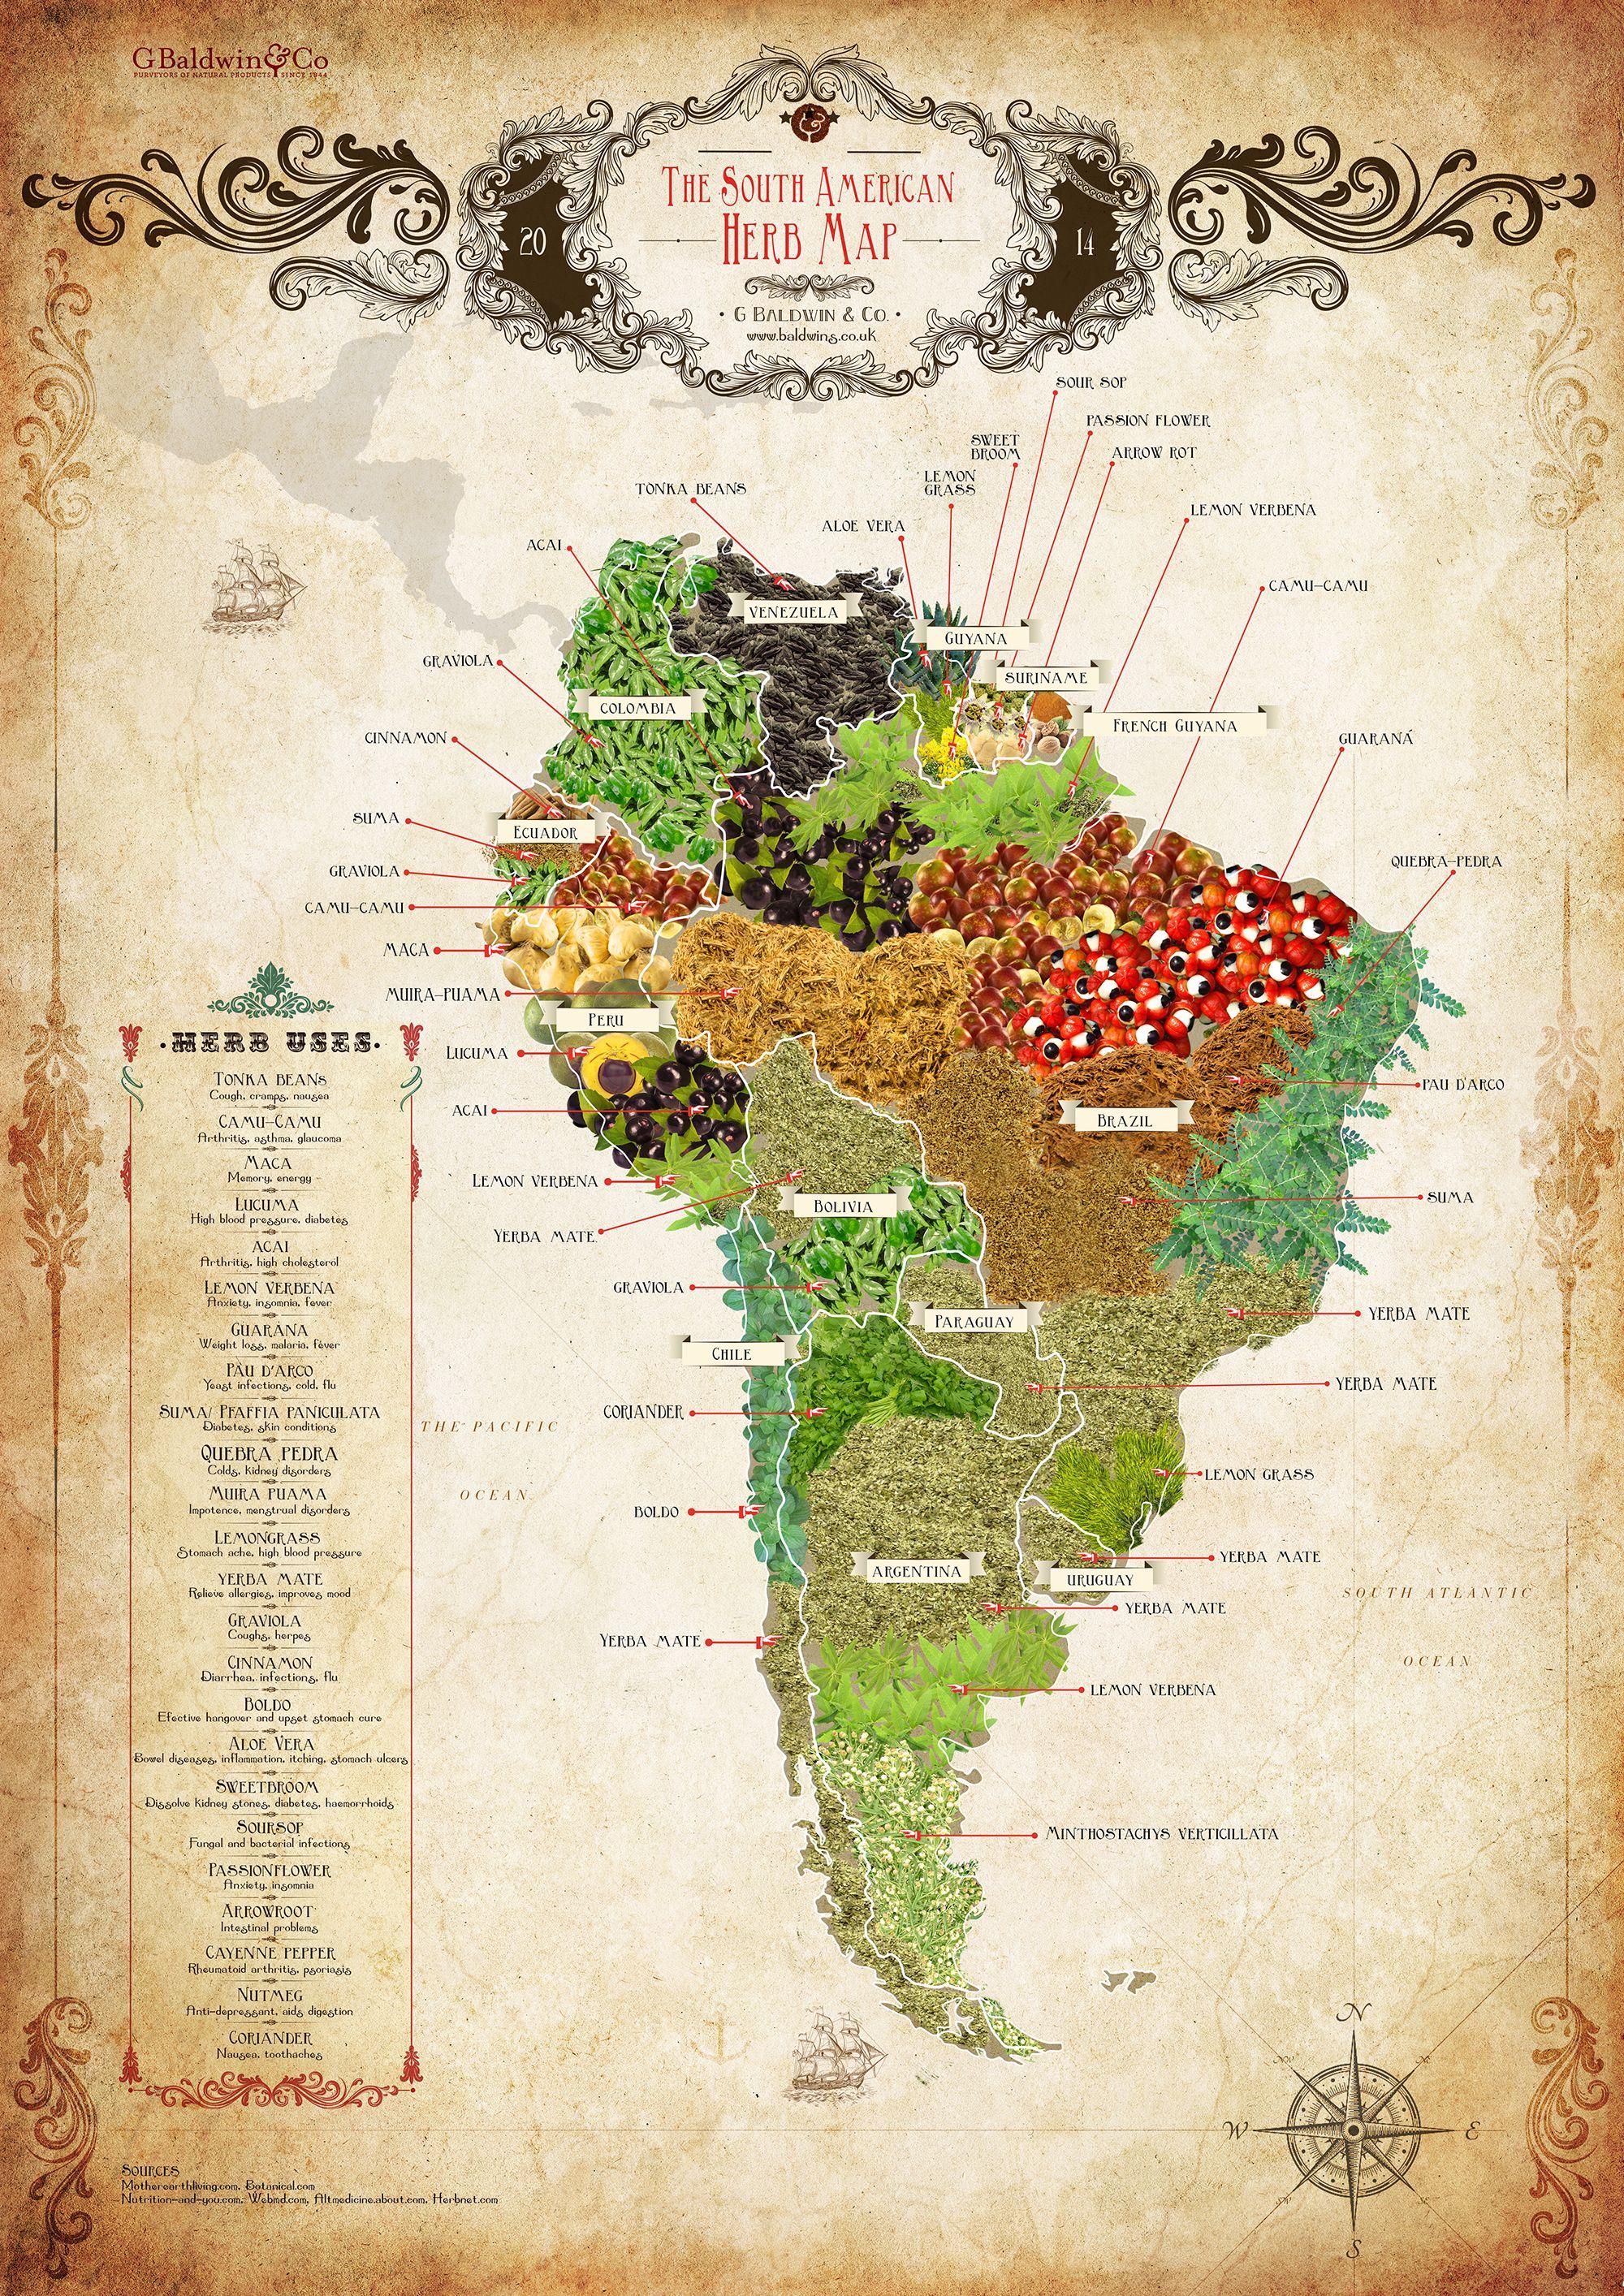 Baldwins South American Herb Map Download Share Botanica - World map latin america us